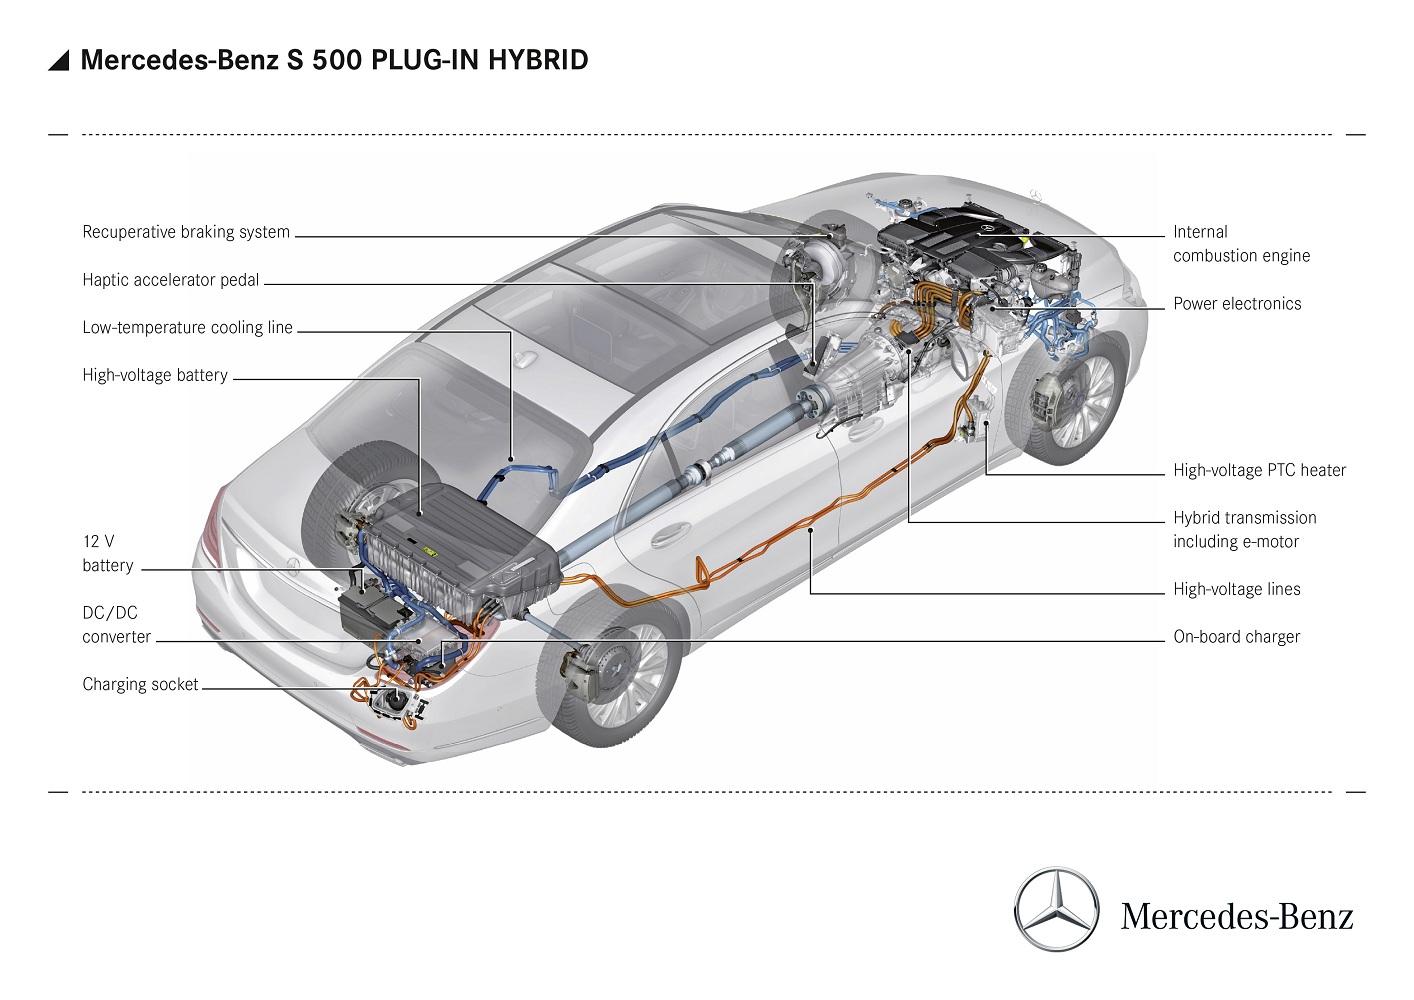 mercedes engine diagram mercedes image wiring the new mercedes s 500 plug in hybrid on mercedes [ 1414 x 1000 Pixel ]